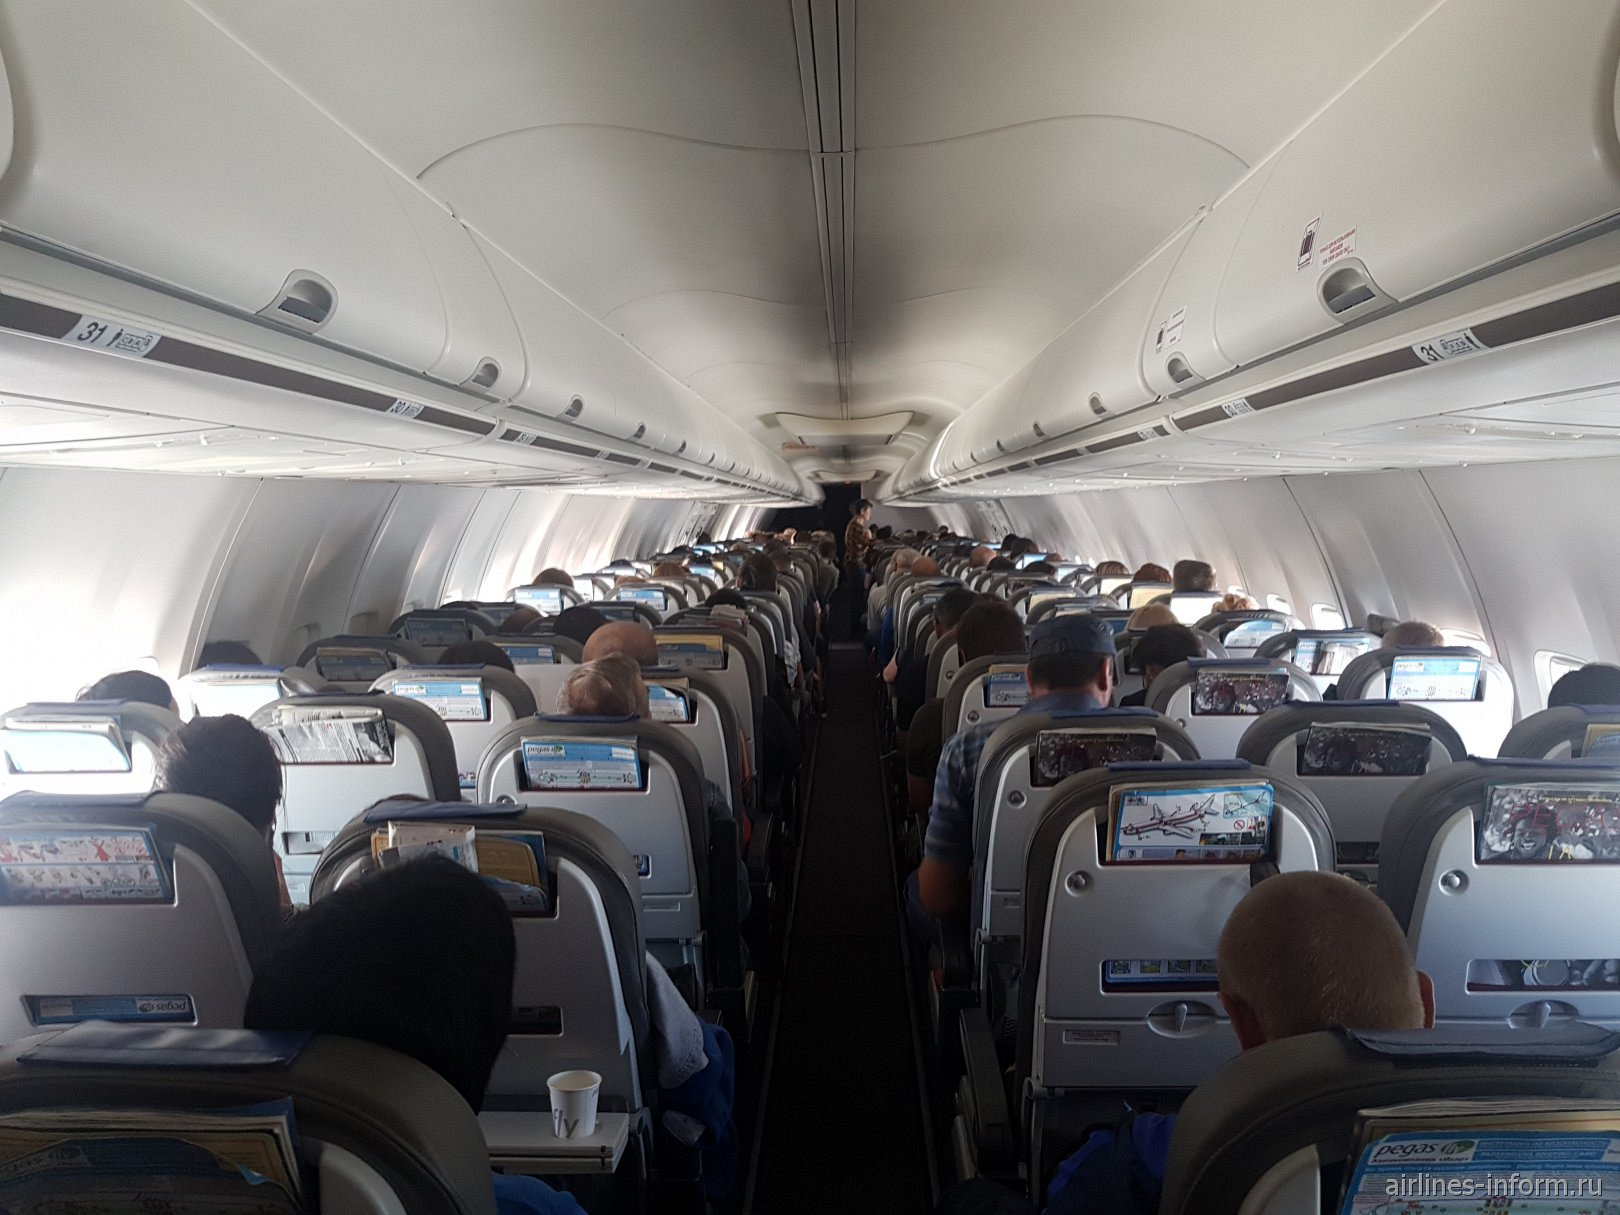 Пассажирский салон в самолете Боинг-737-800 авиакомпании Nordwind